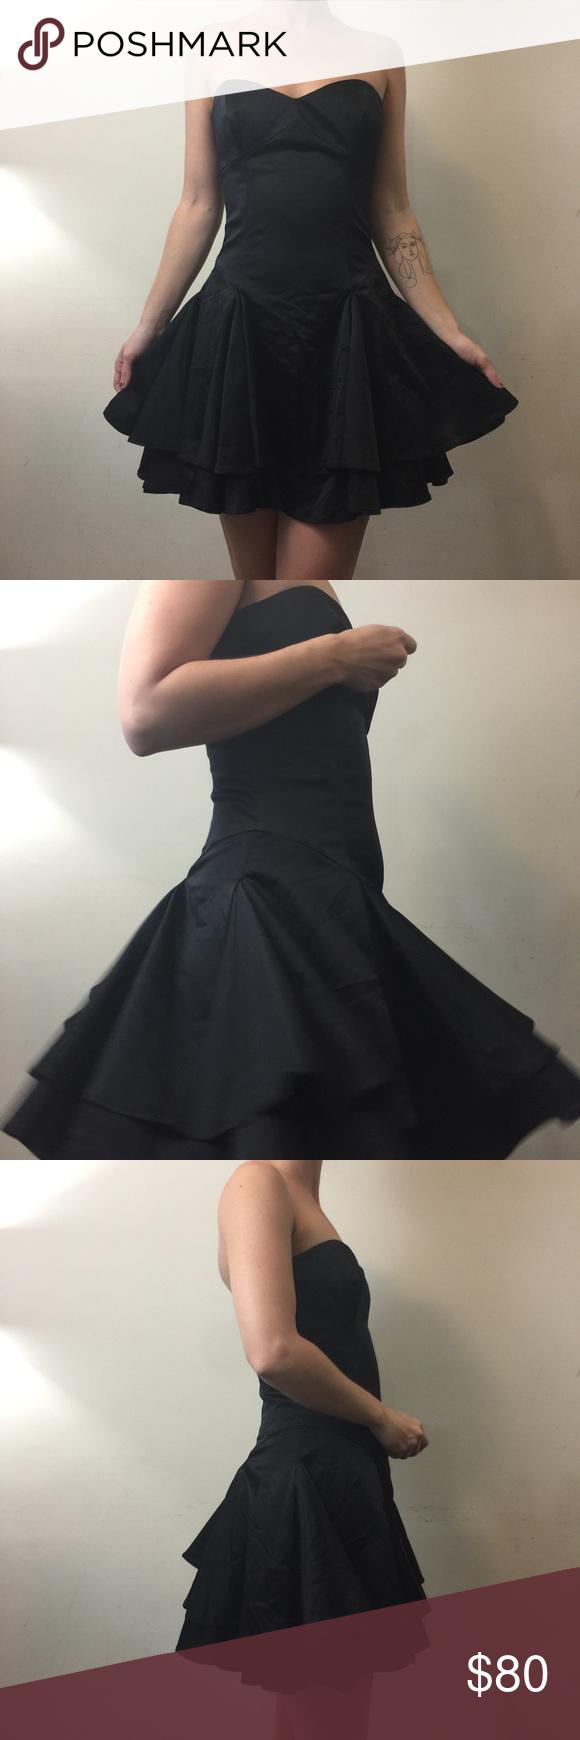 36++ Bebe black zipper dress ideas